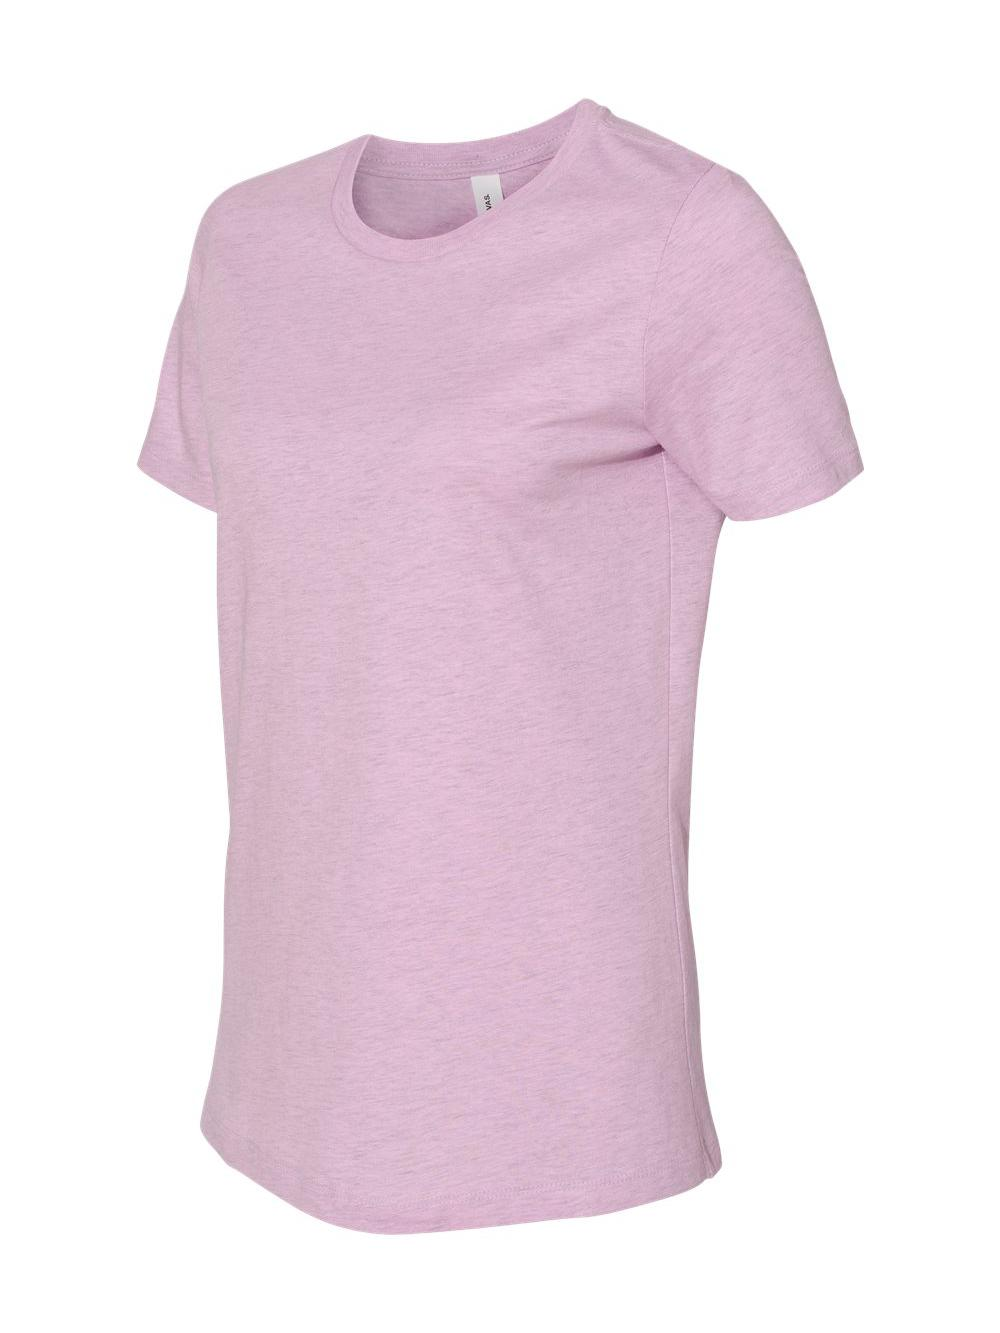 Bella-Canvas-Women-039-s-Relaxed-Short-Sleeve-Jersey-Tee-6400 thumbnail 35